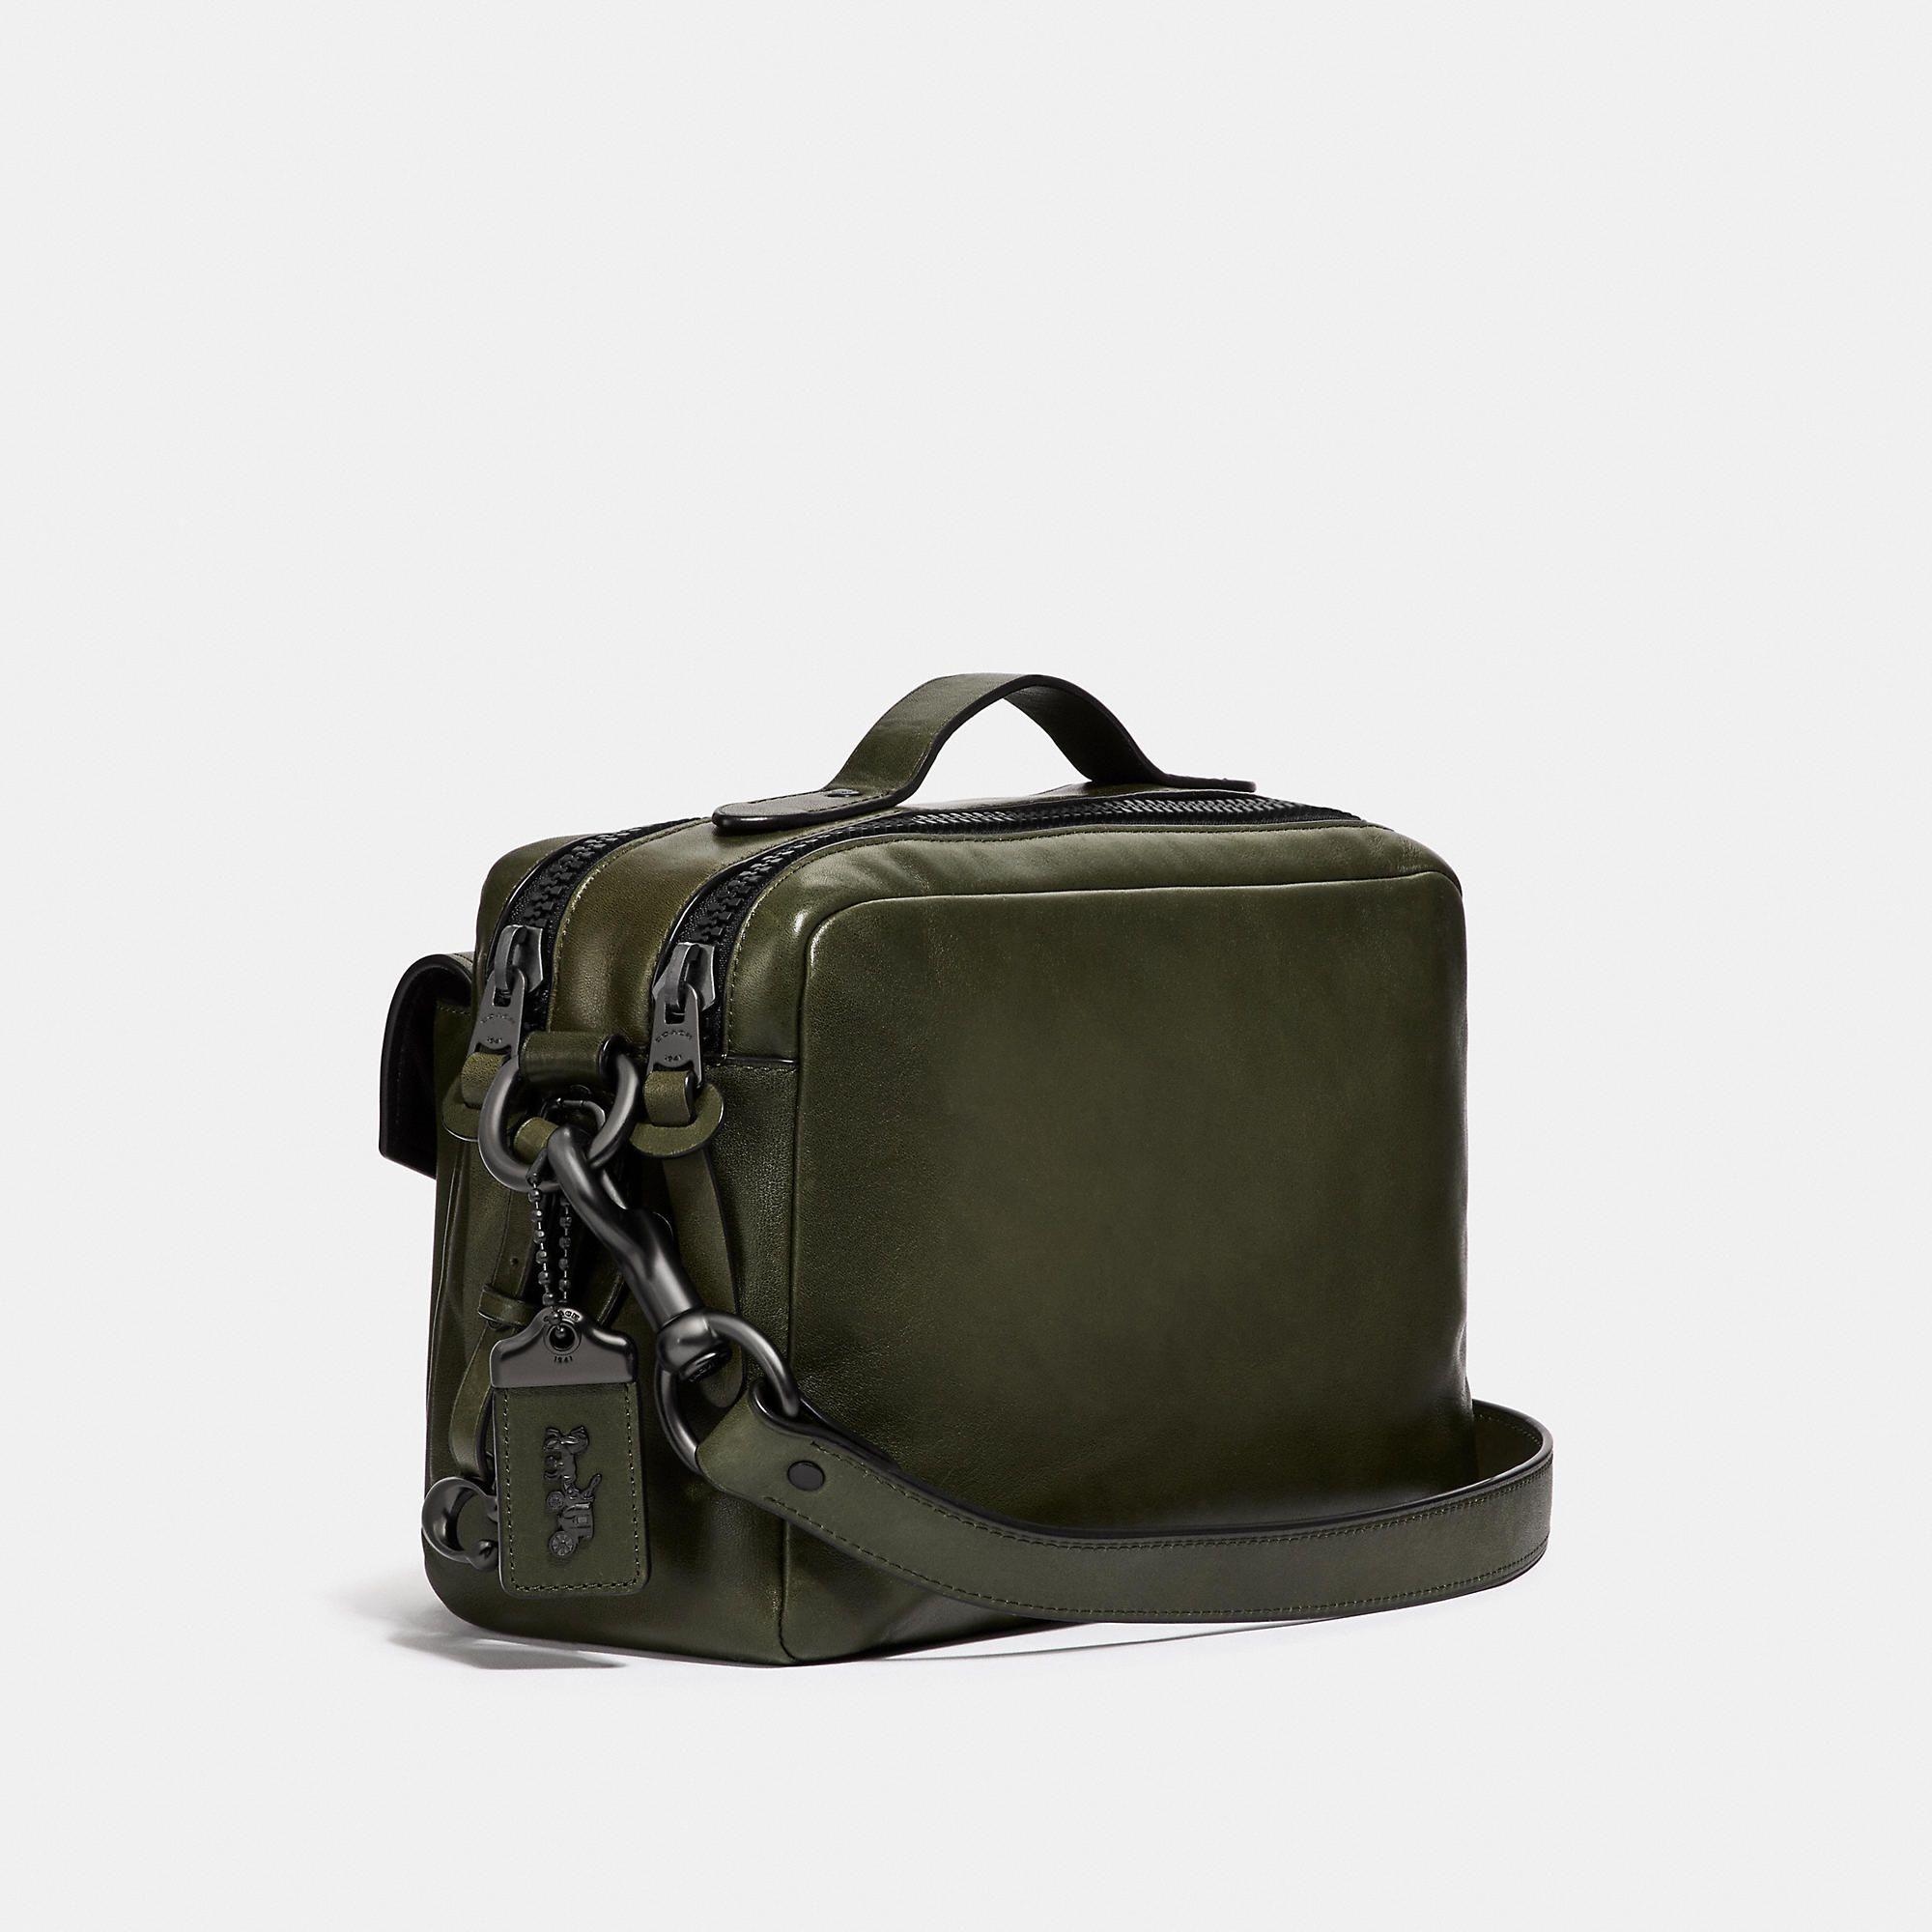 d6b0824d03 Jaxson bag 28 in 2019 | Products | Bags, Coach men, Satchel